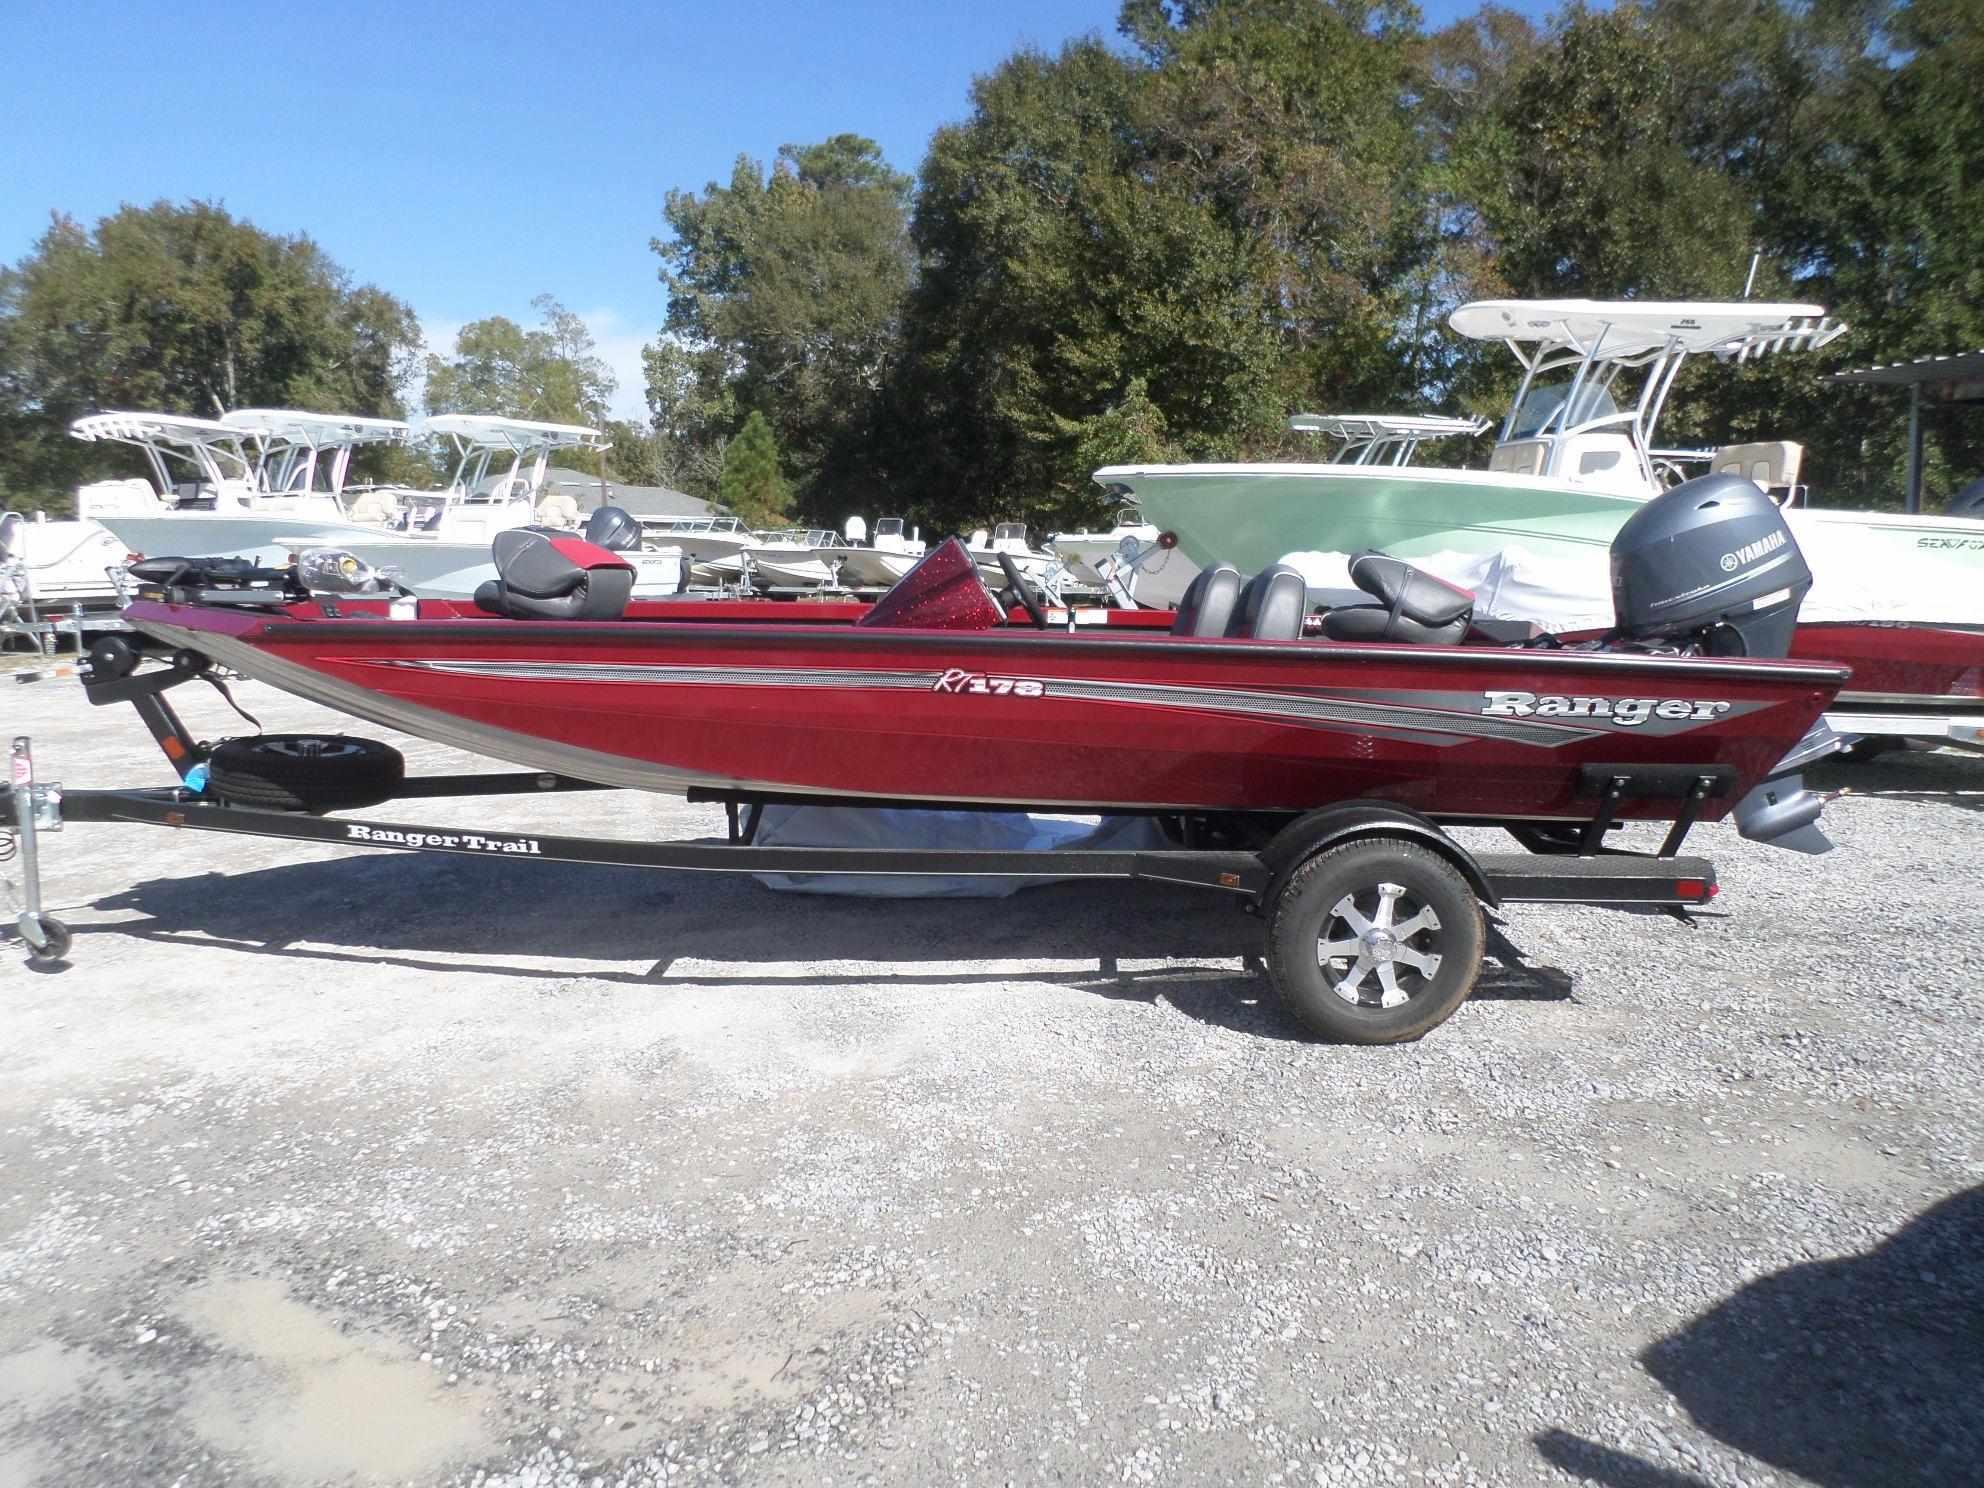 2010 Gator Trax Duck Boat For Sale in Outside Louisiana Louisiana